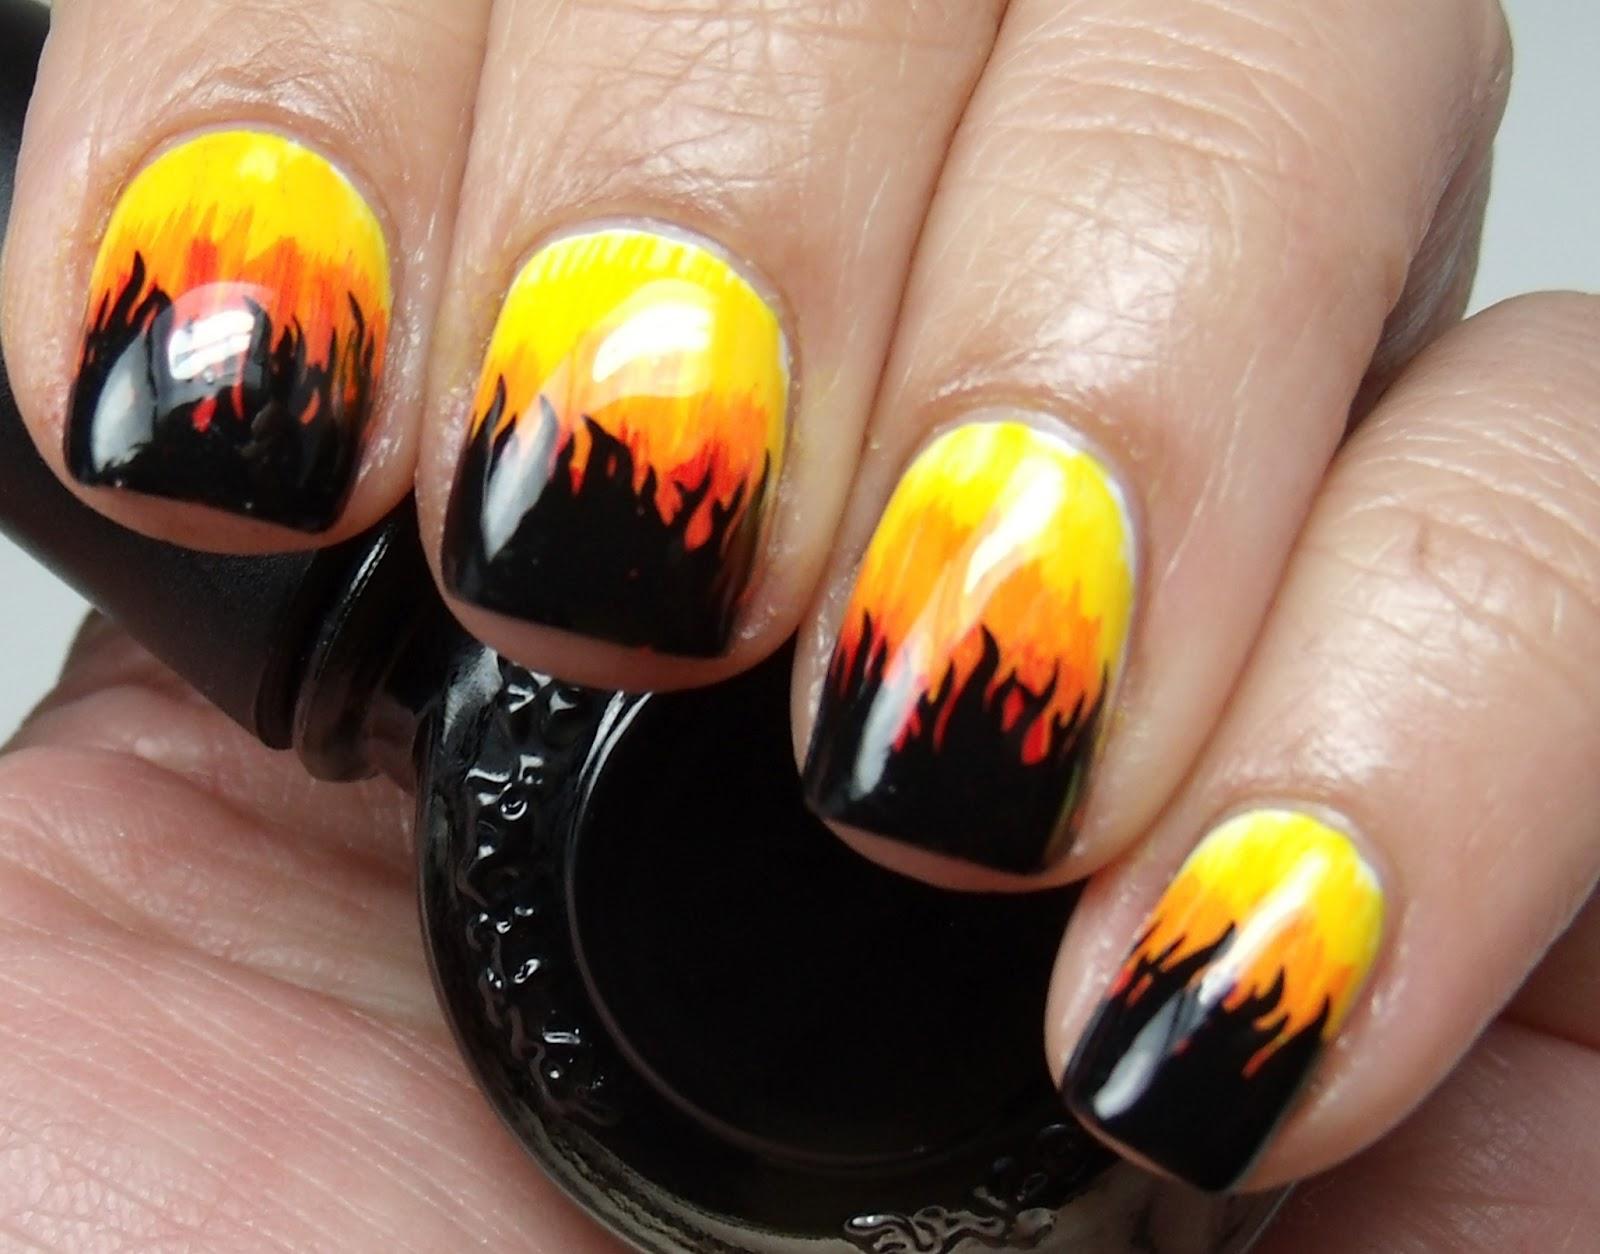 Colores de Carol: Nails on Fire!